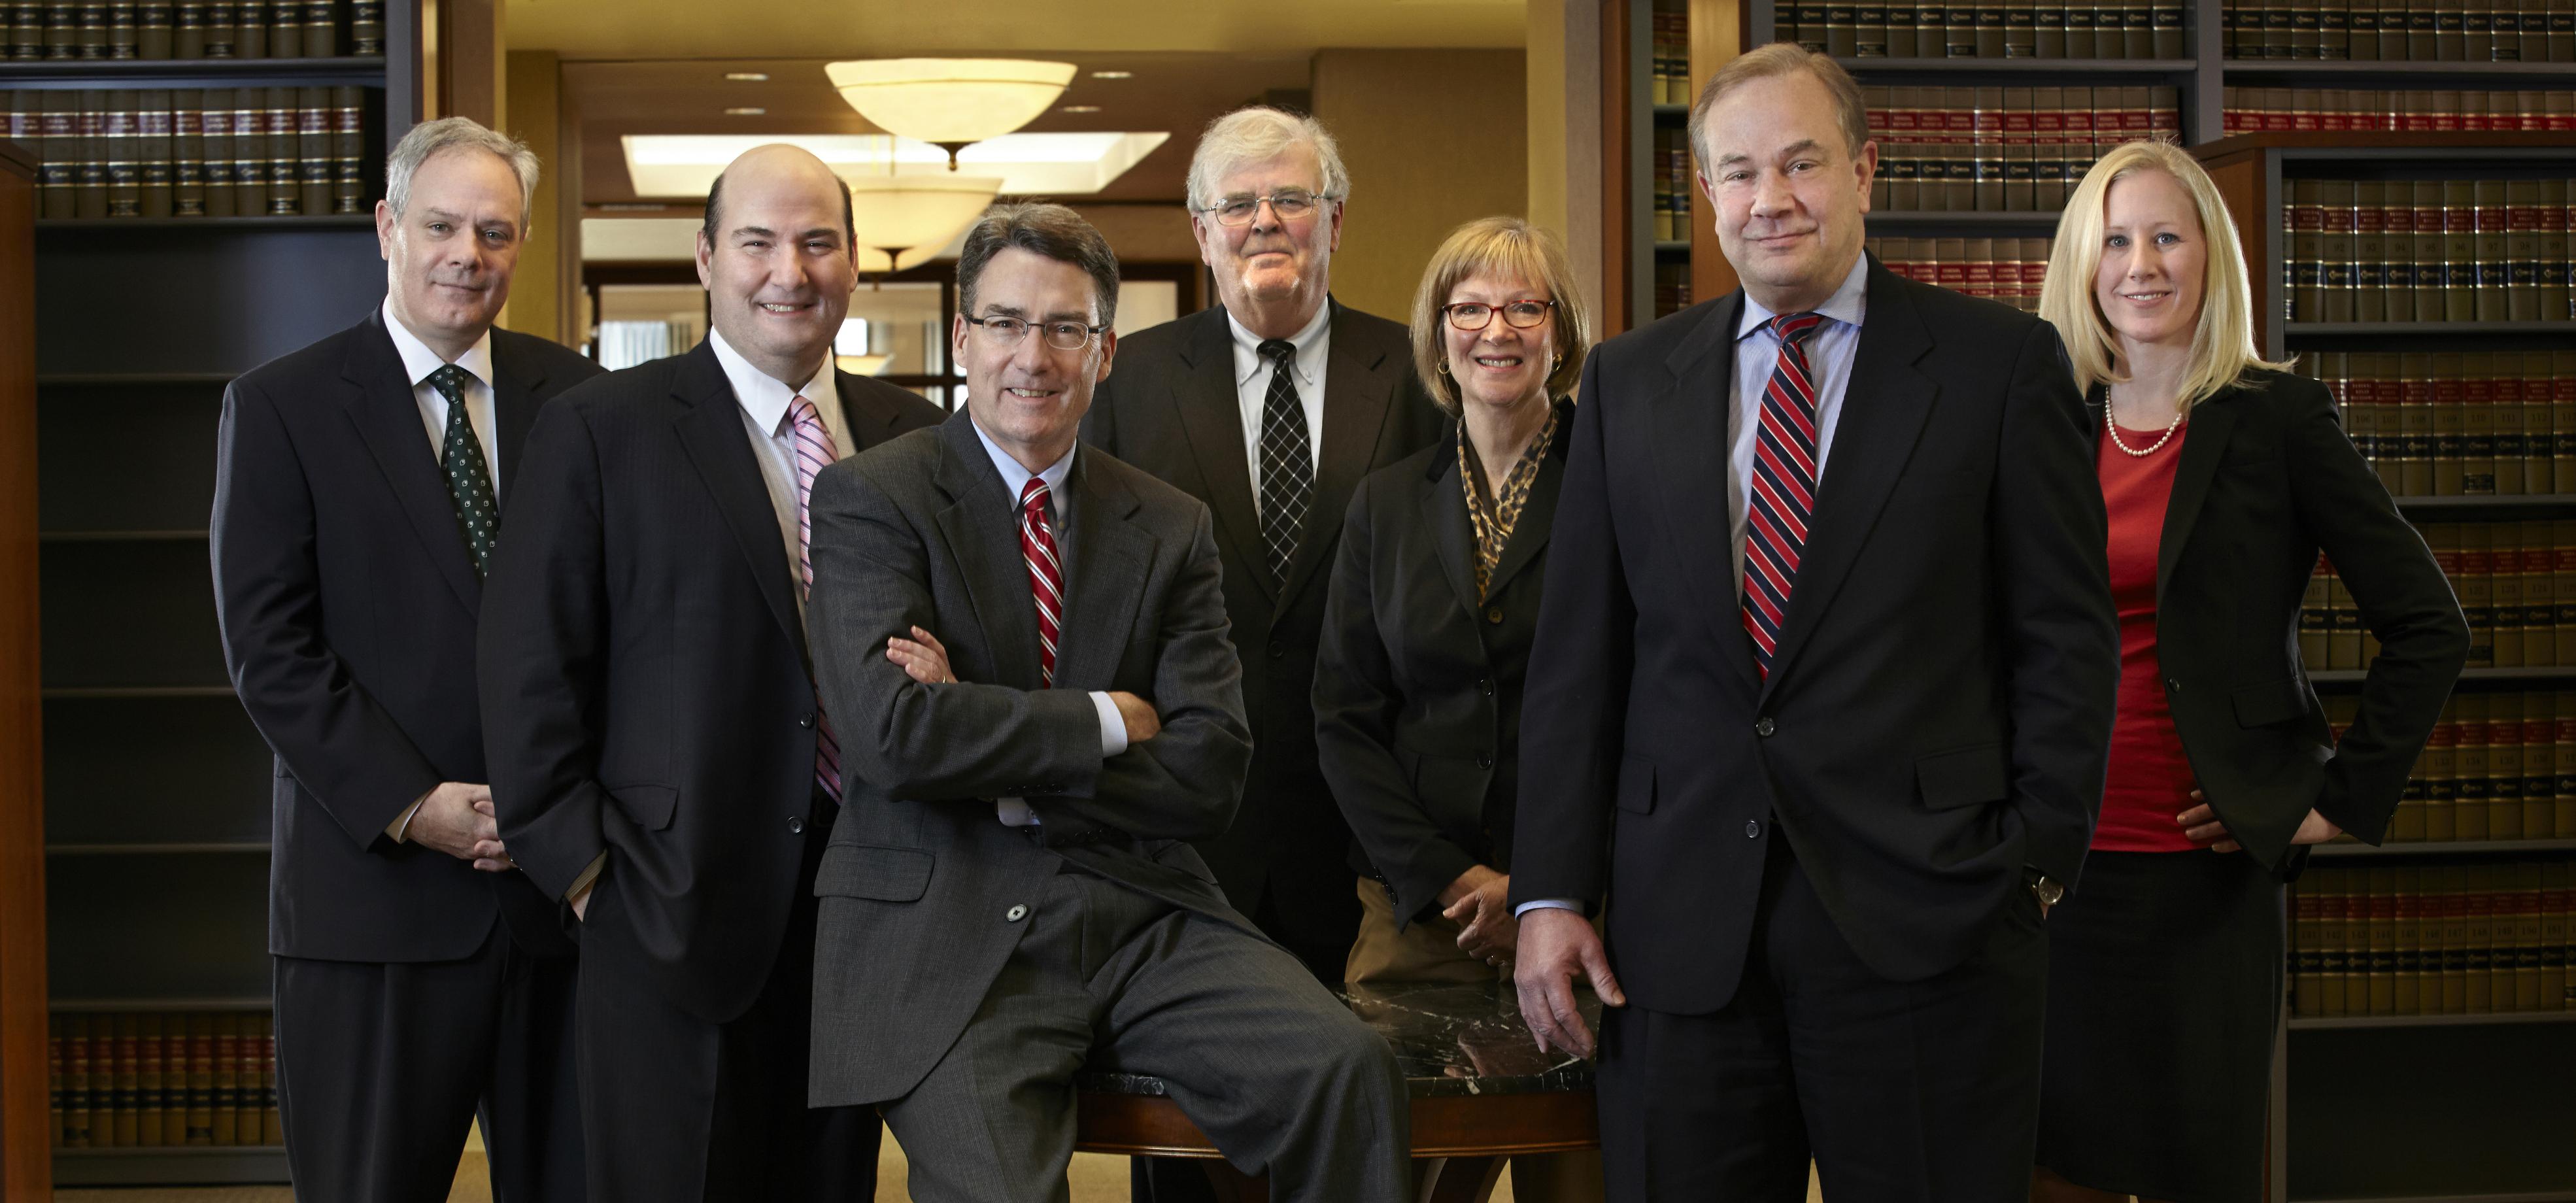 Strauss Troy Attorneys Labor & Employment Group 2015 Cincinnati, OH